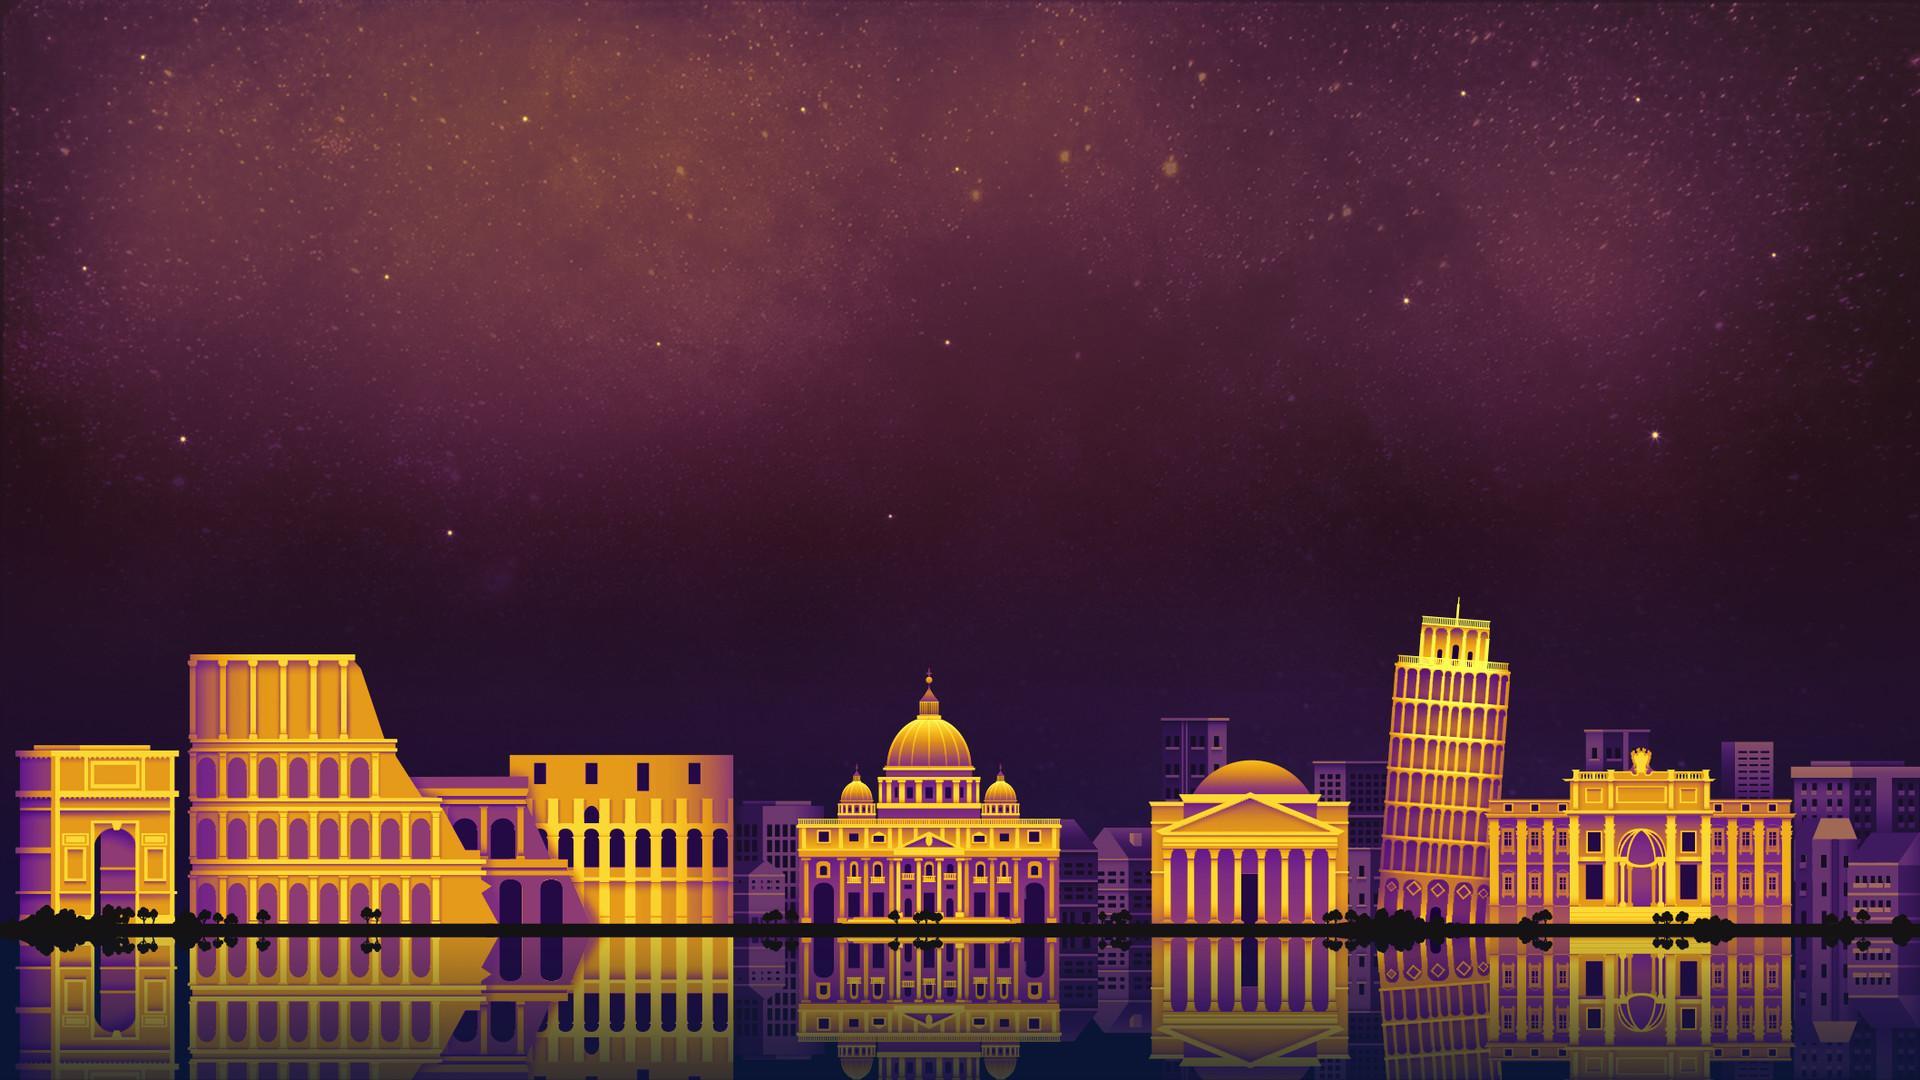 Caio perez rome city